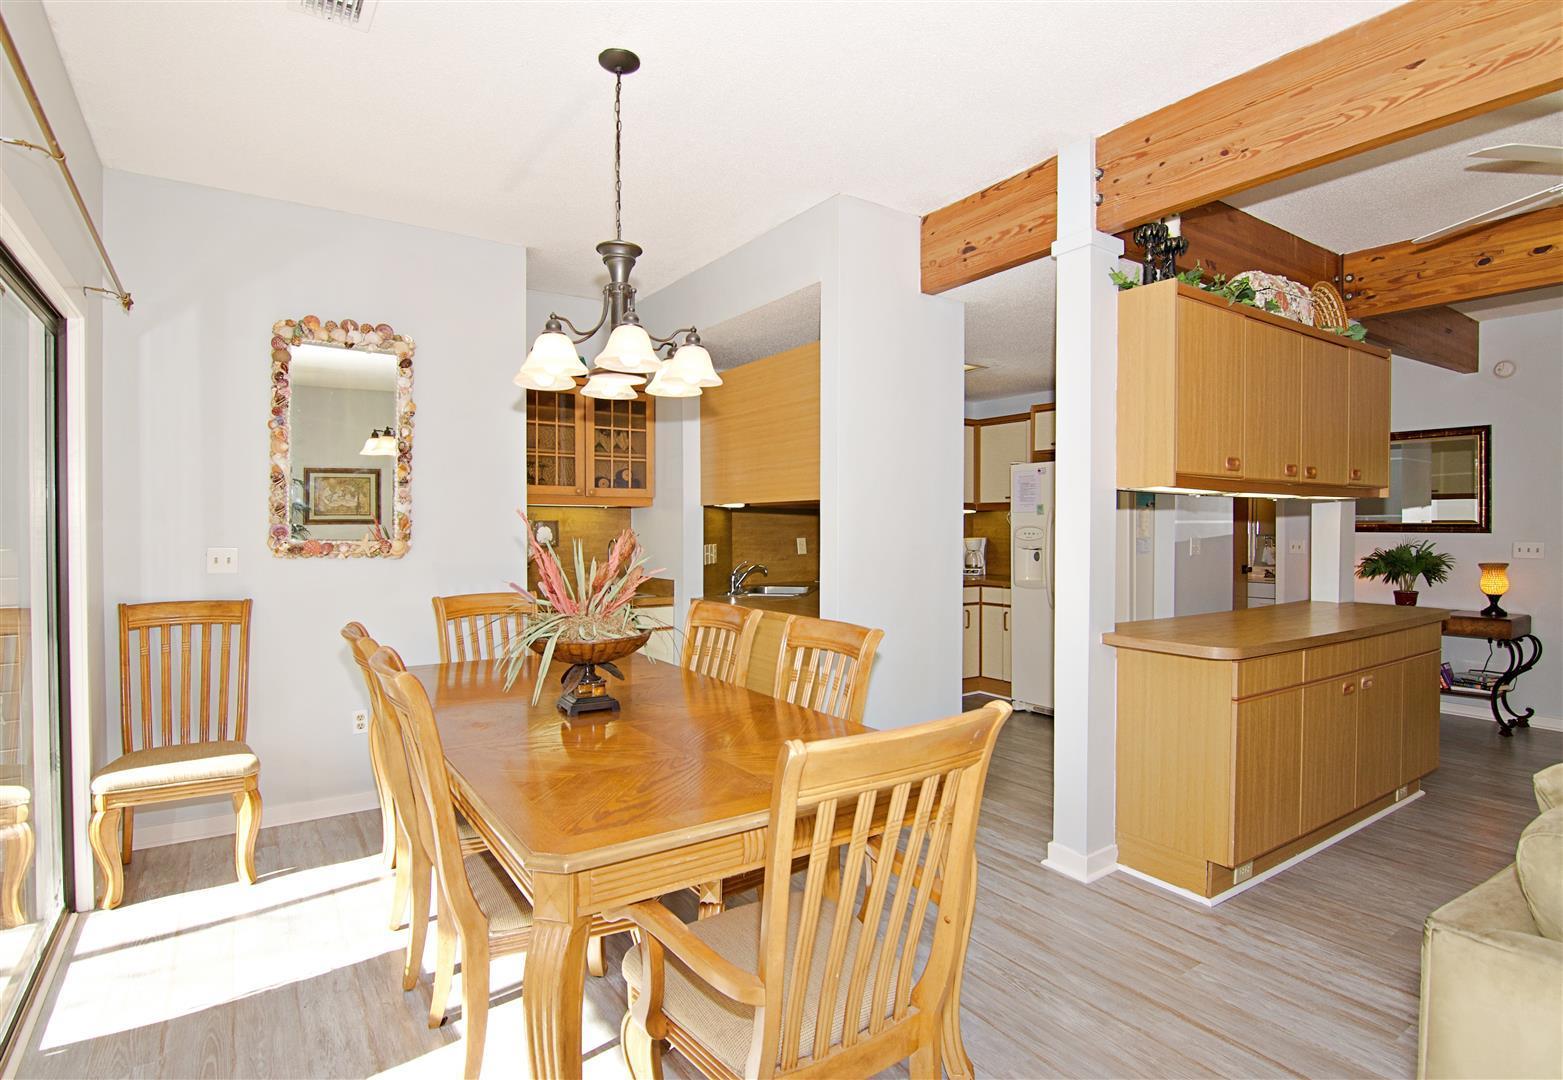 Seabrook Island Homes For Sale - 3020 Ocean Winds, Seabrook Island, SC - 36